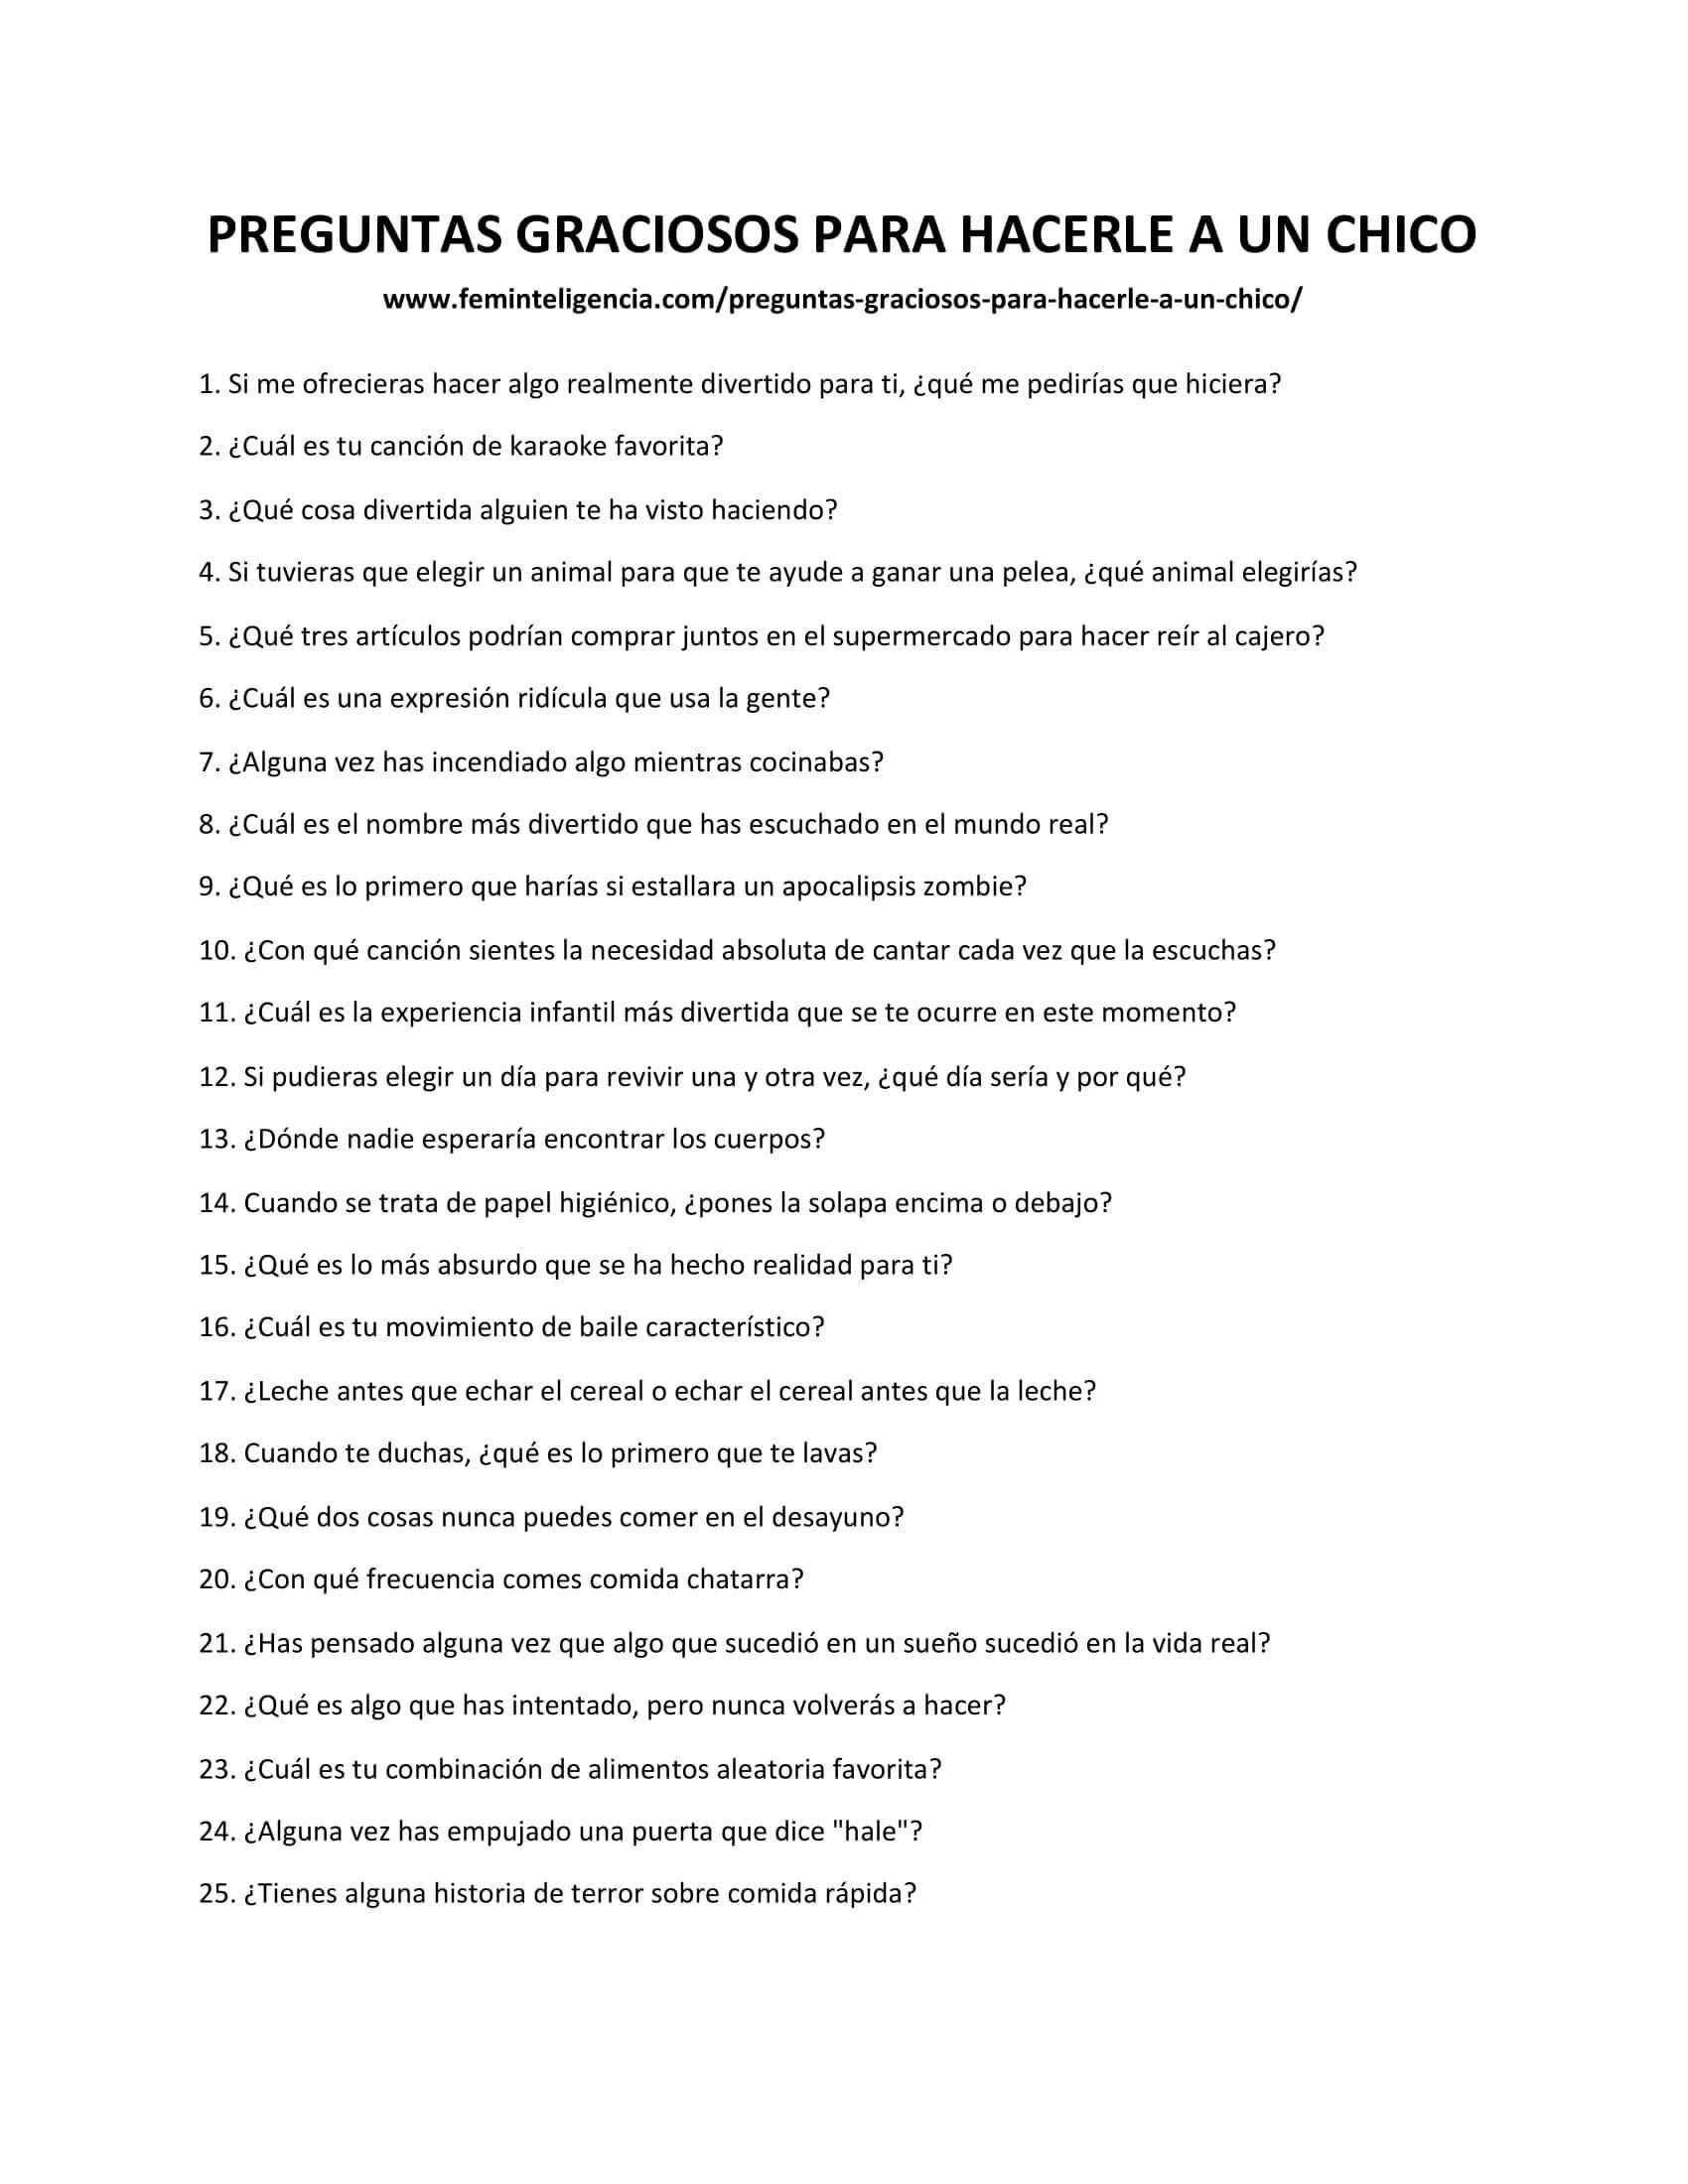 Lista de preguntas